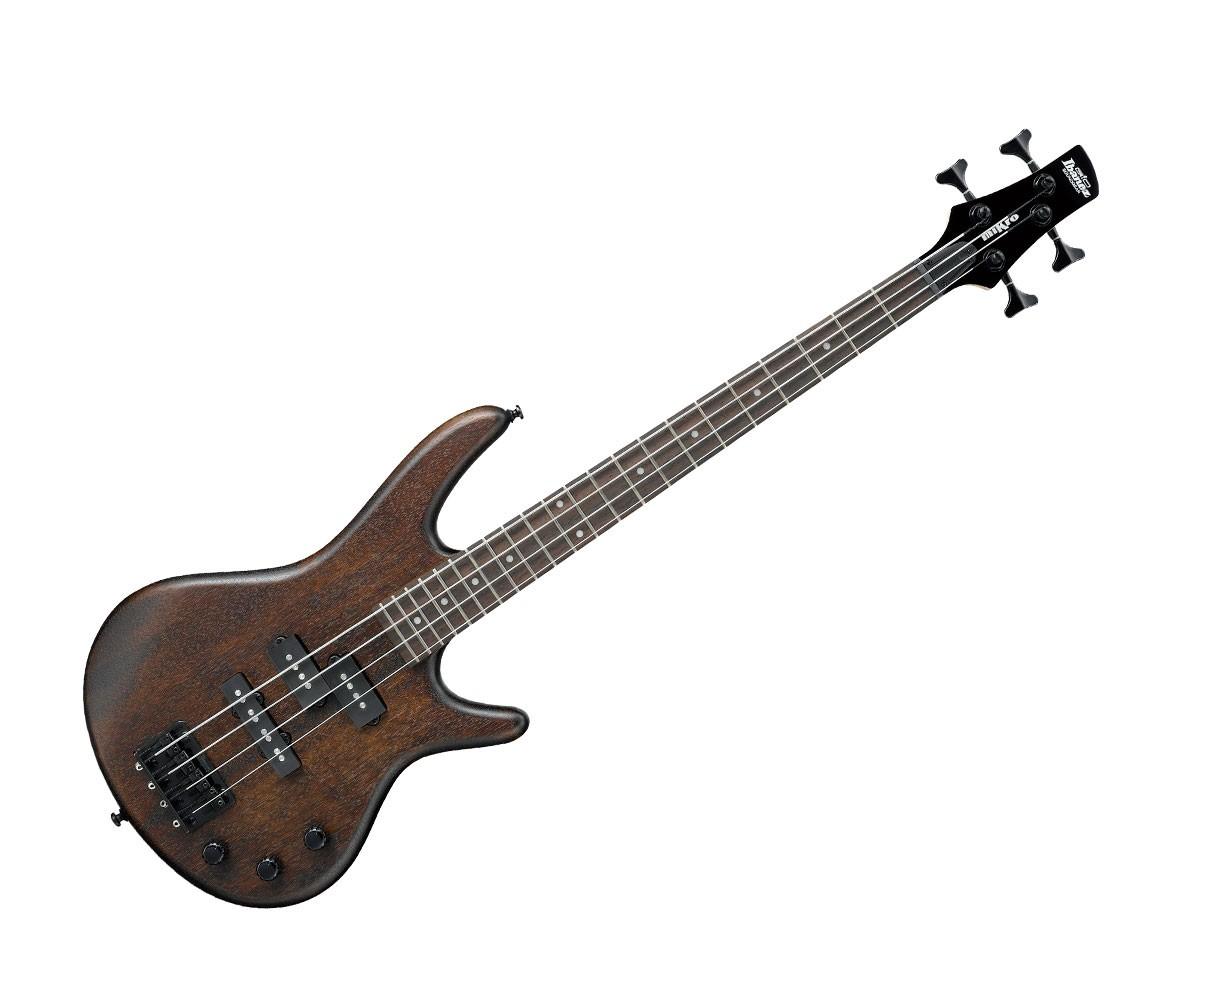 Ibanez GSRM20B Electric Bass Guitar - Walnut Flat